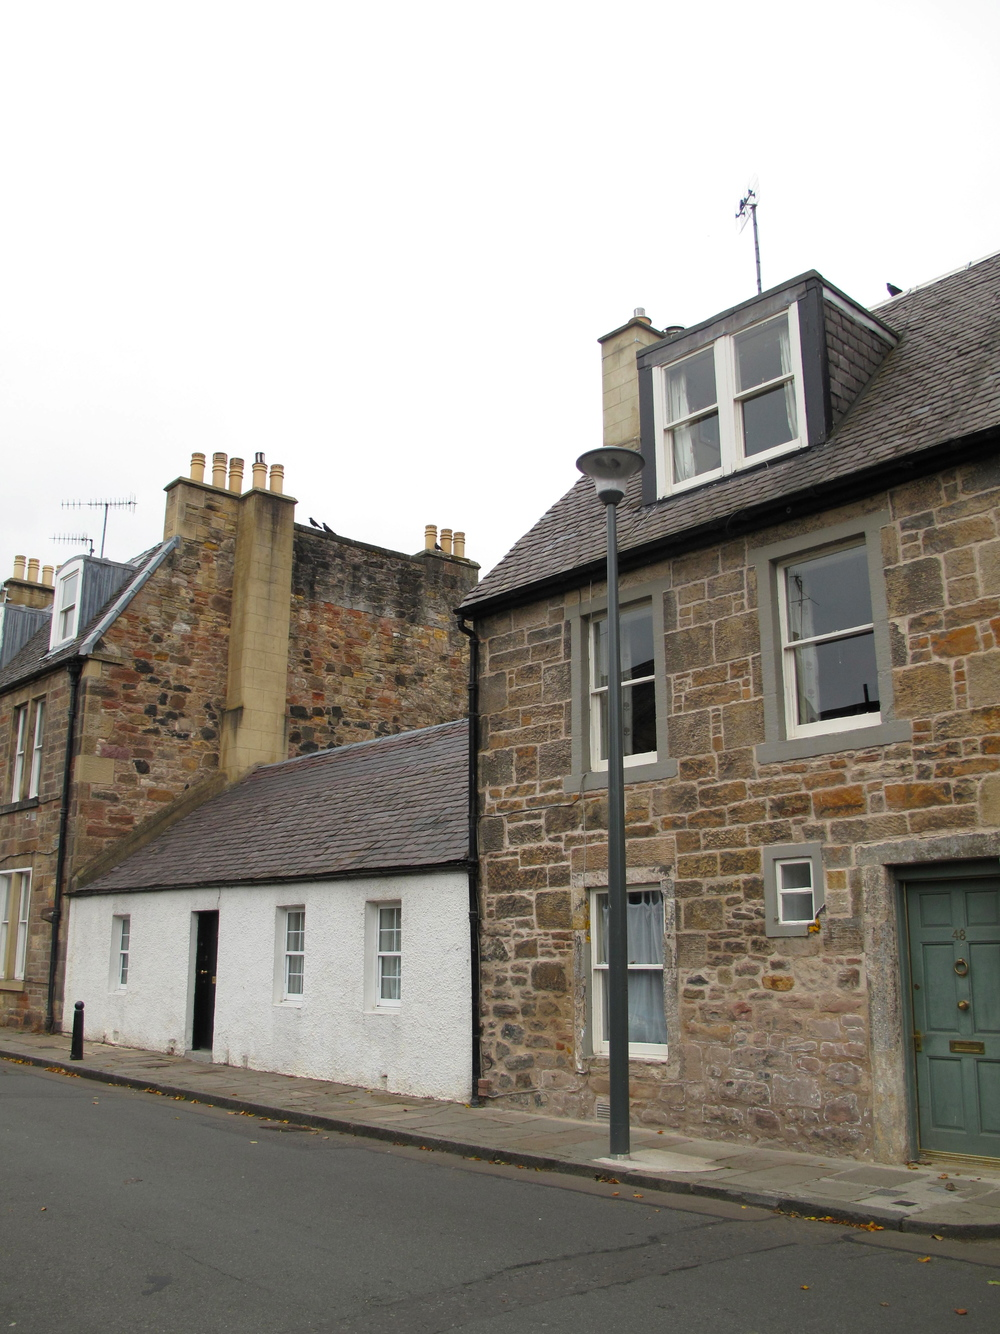 Duddingston Village houses - little stone houses in Scottish style.